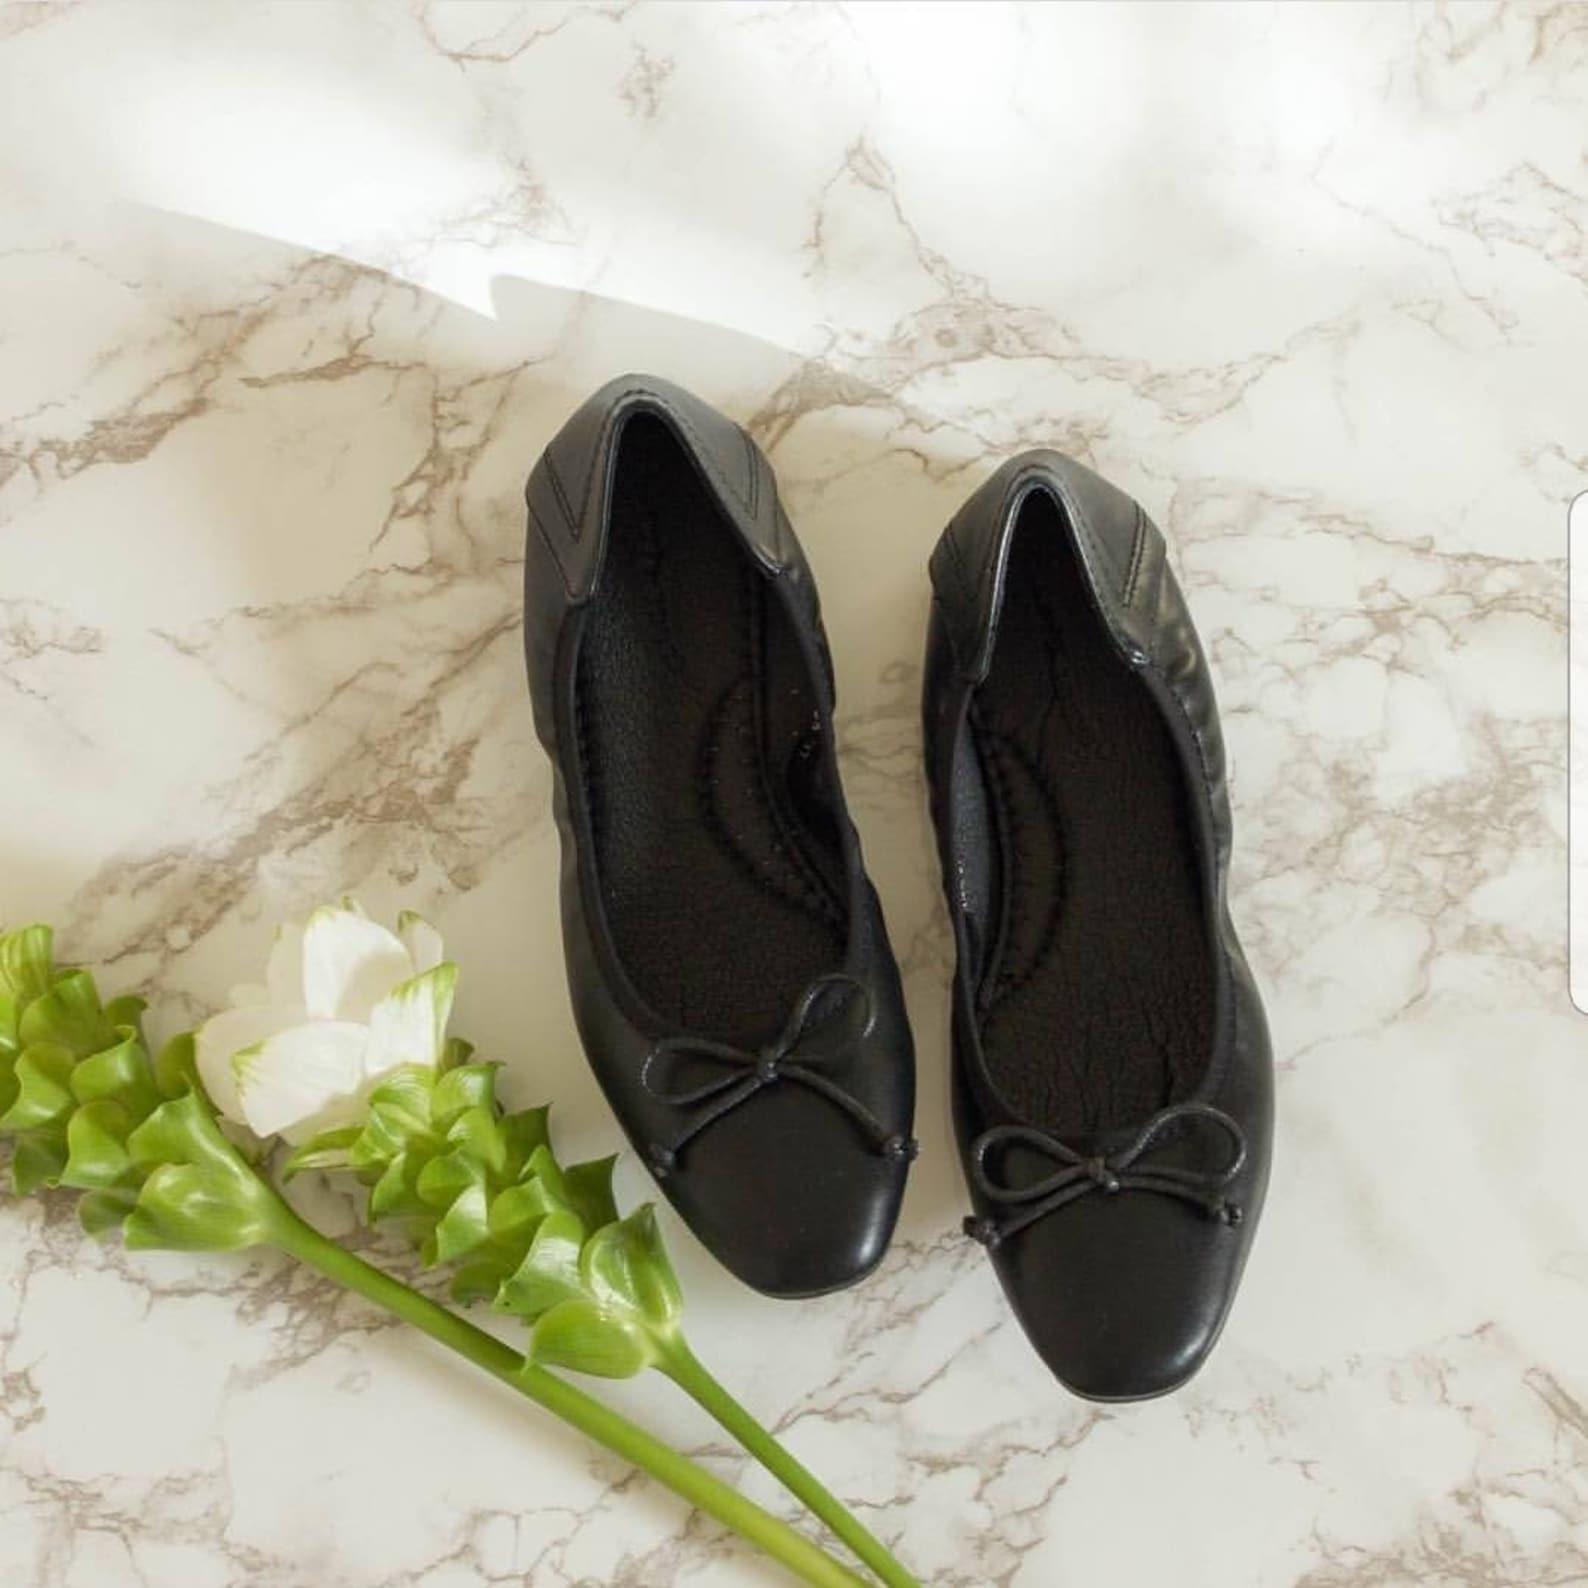 ballet flats, classic ballet flats, comfy ballet flats, ballerina flats, gift for her, ballerina shoes, working shoes, black sho